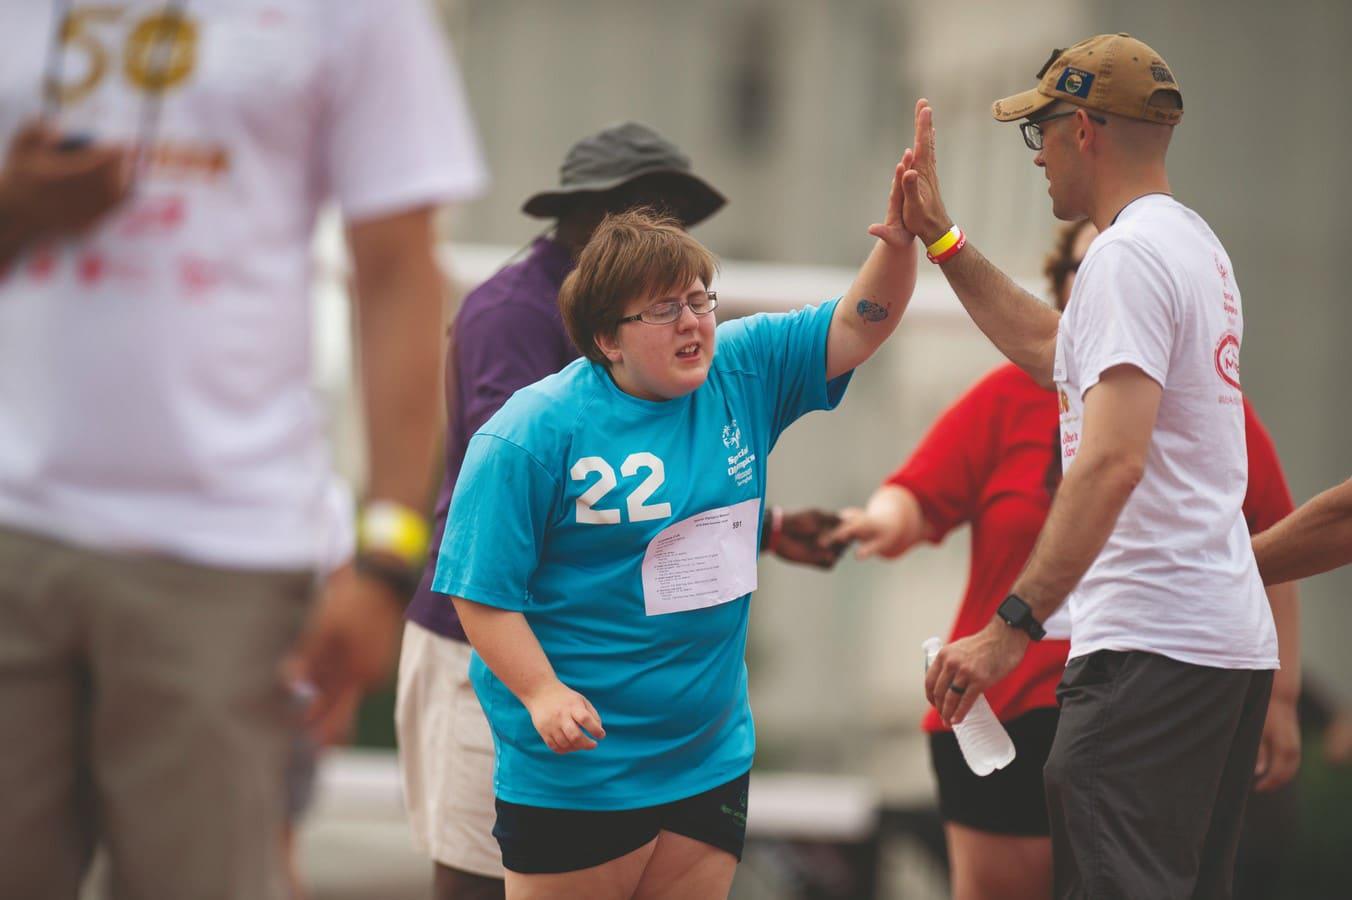 Athlete in blue shirt high-fives volunteer